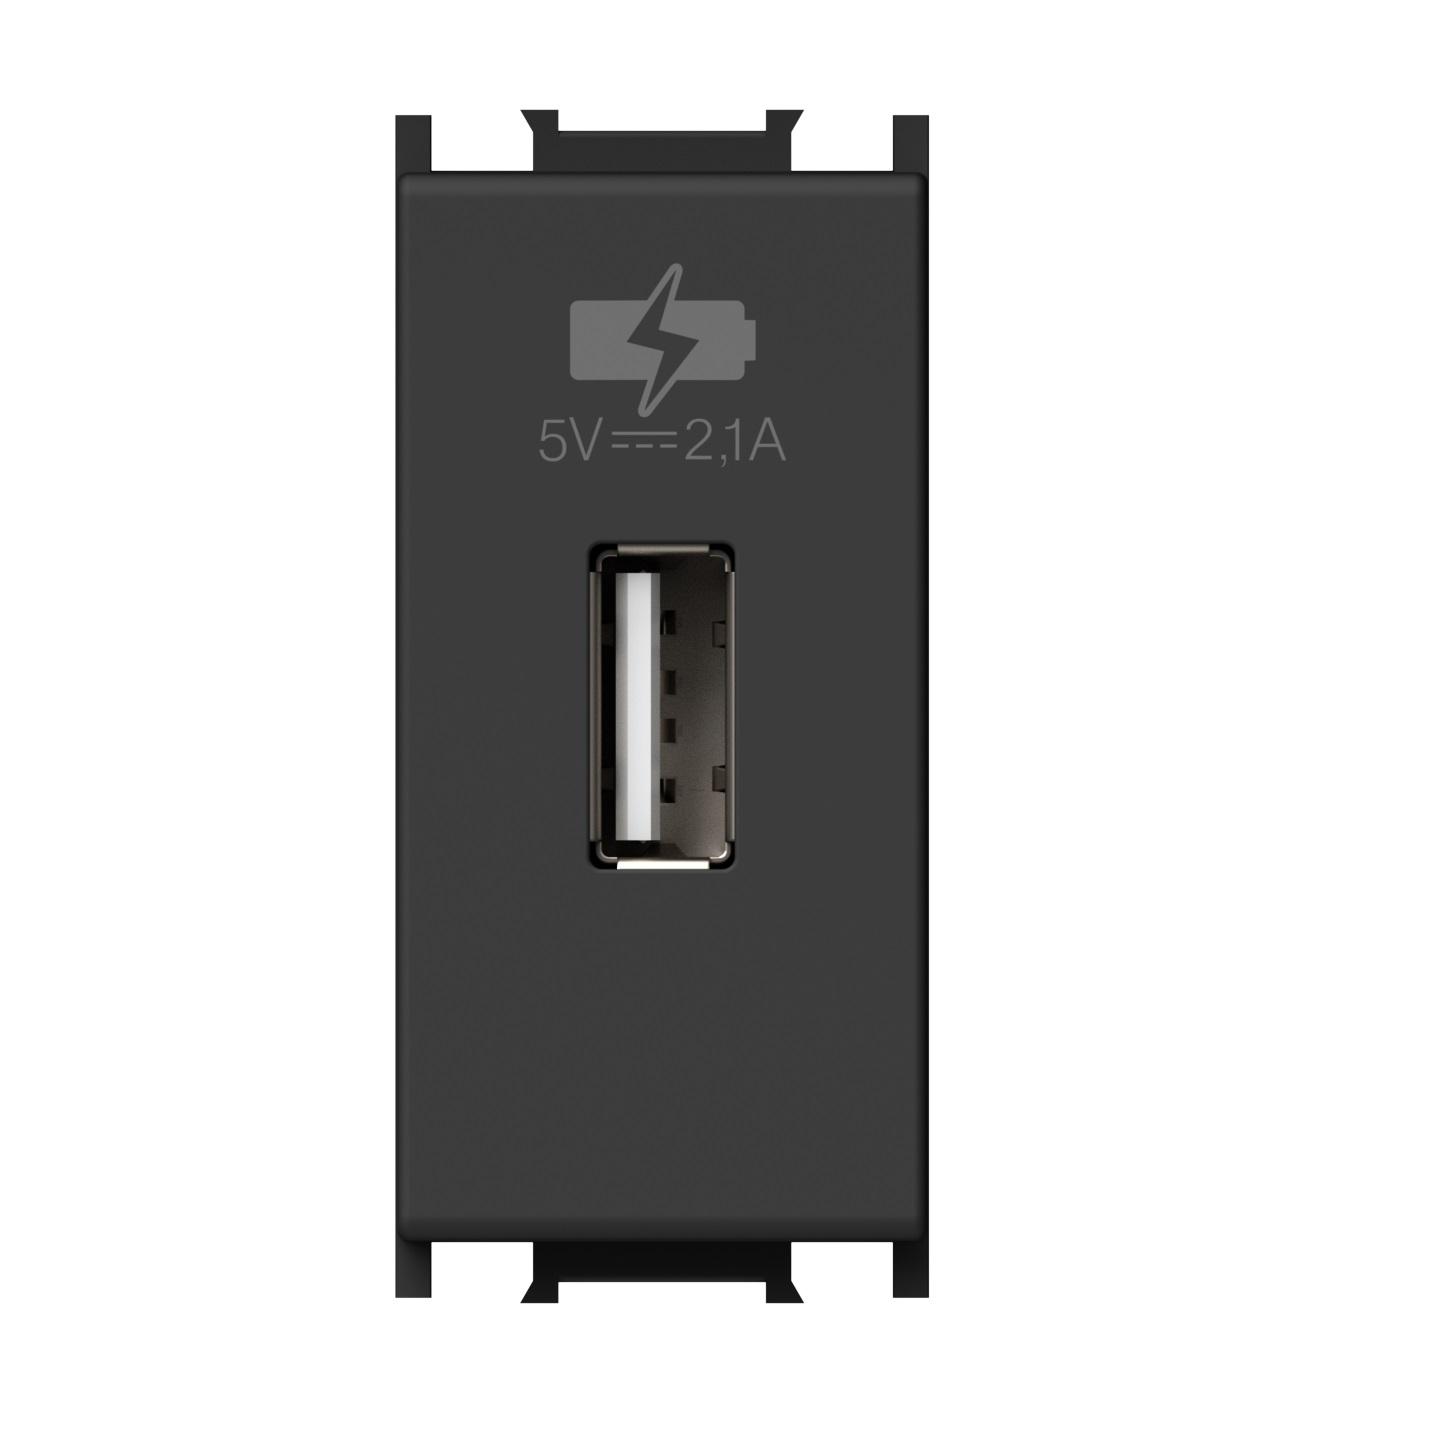 1 Stk USB Ladesteckdose, 5V, 2,1A, 1M, schwarz ET111016--